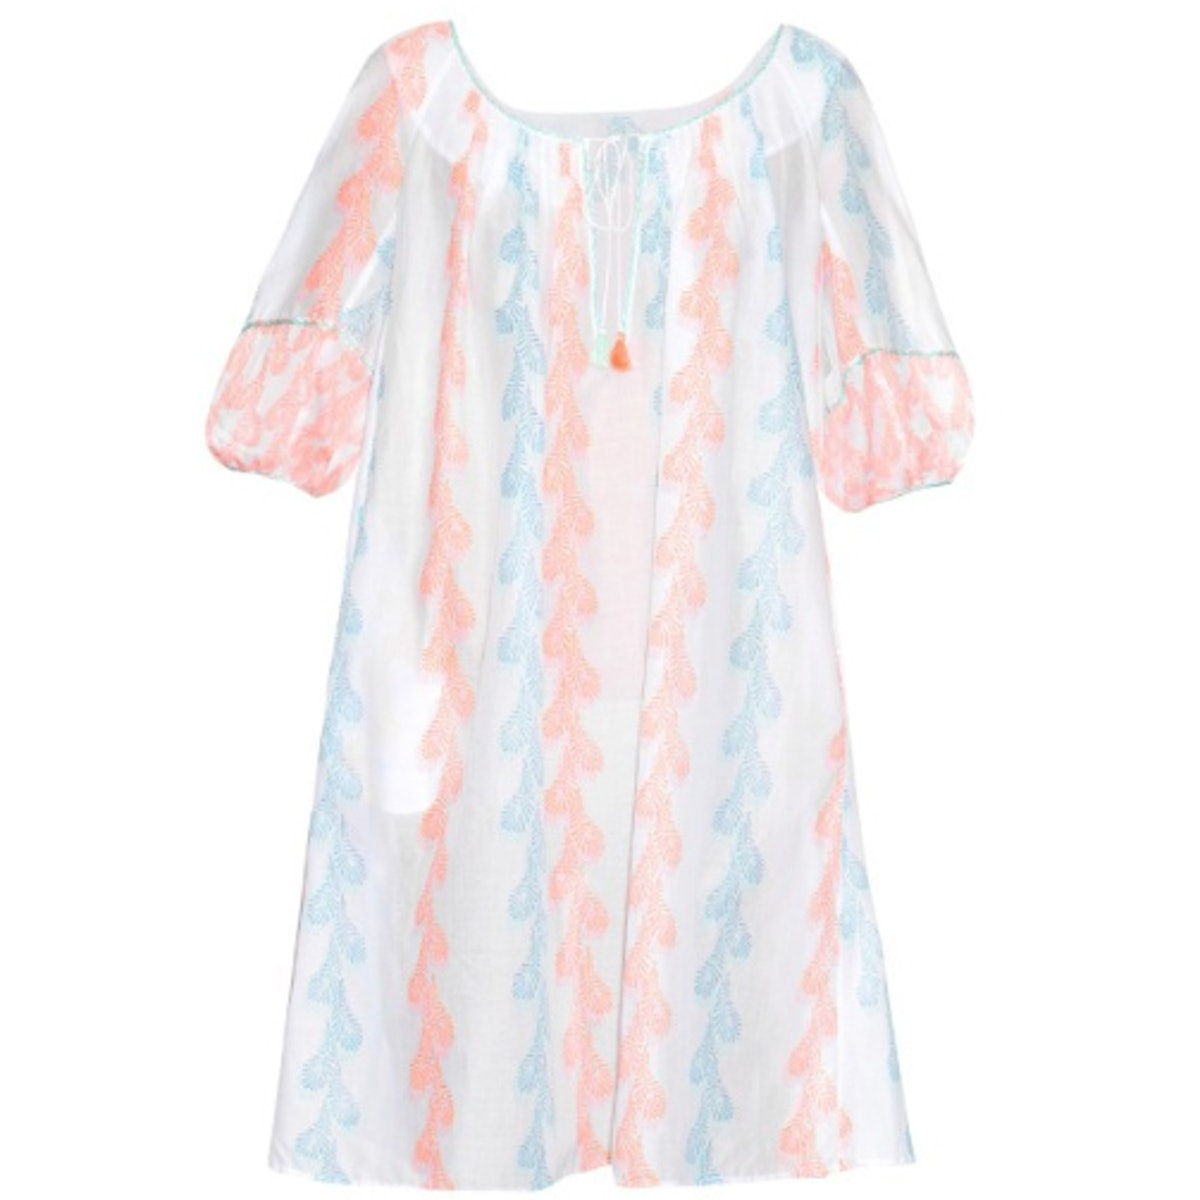 Thierry Colson Eva feather-print dress